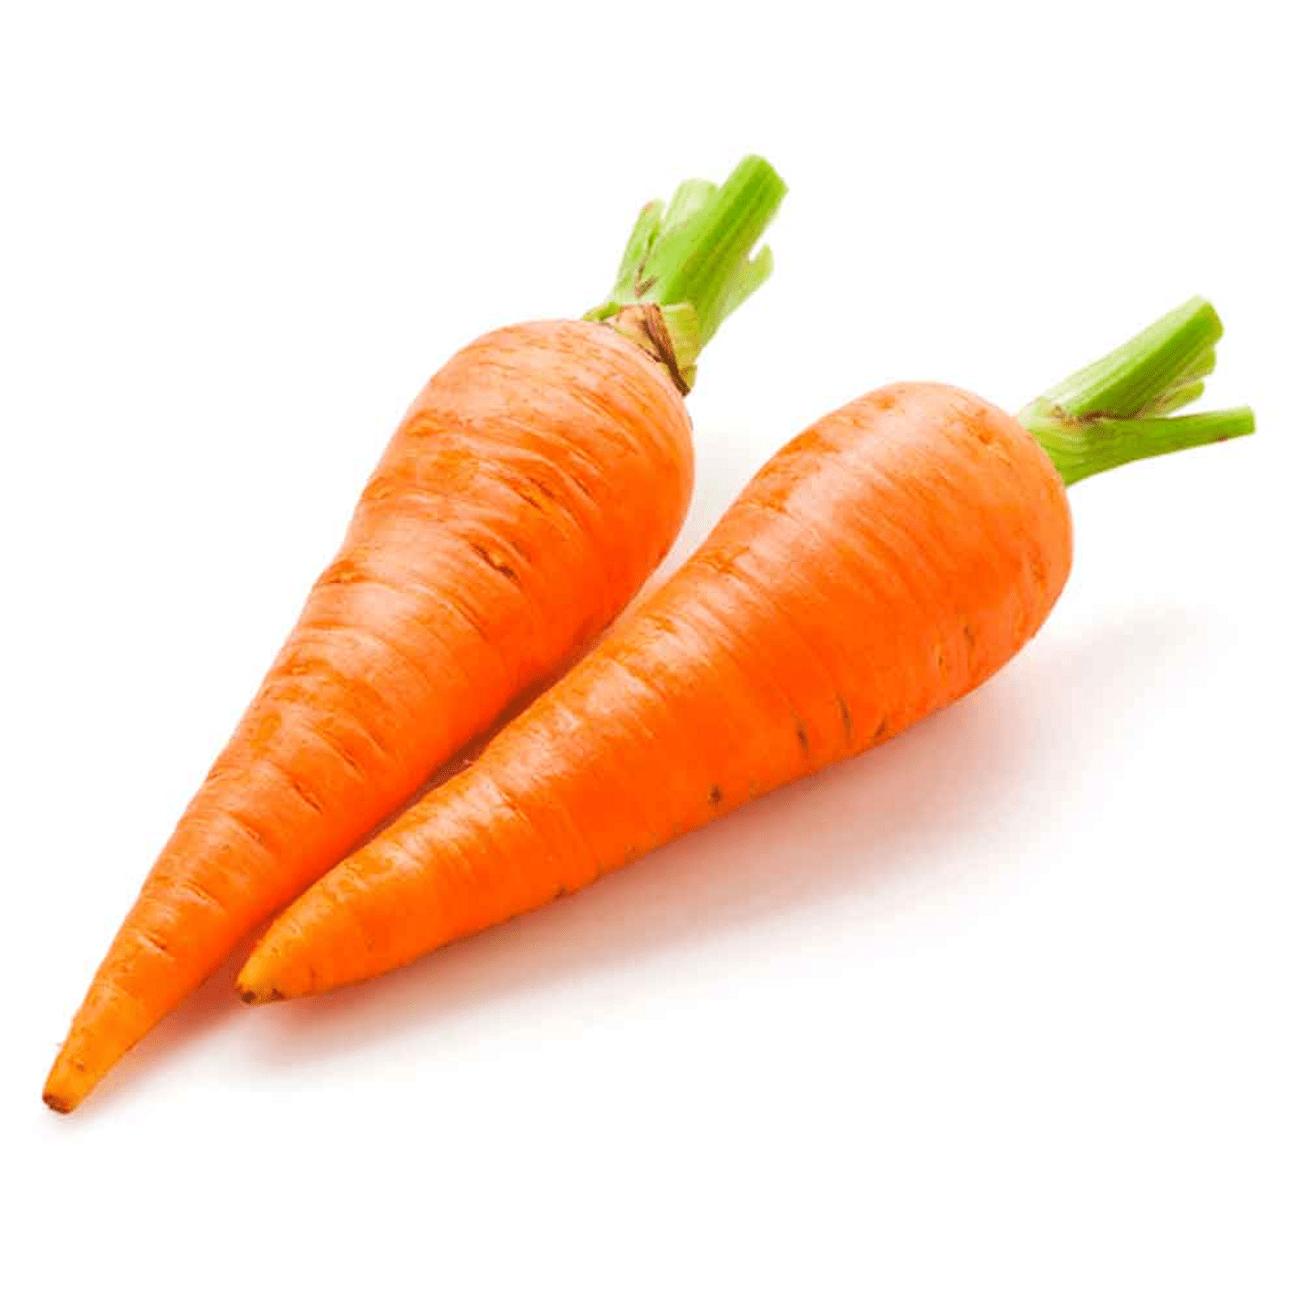 Zanahoria Mercaldas Groups they admin or create will appear here. zanahoria mercaldas